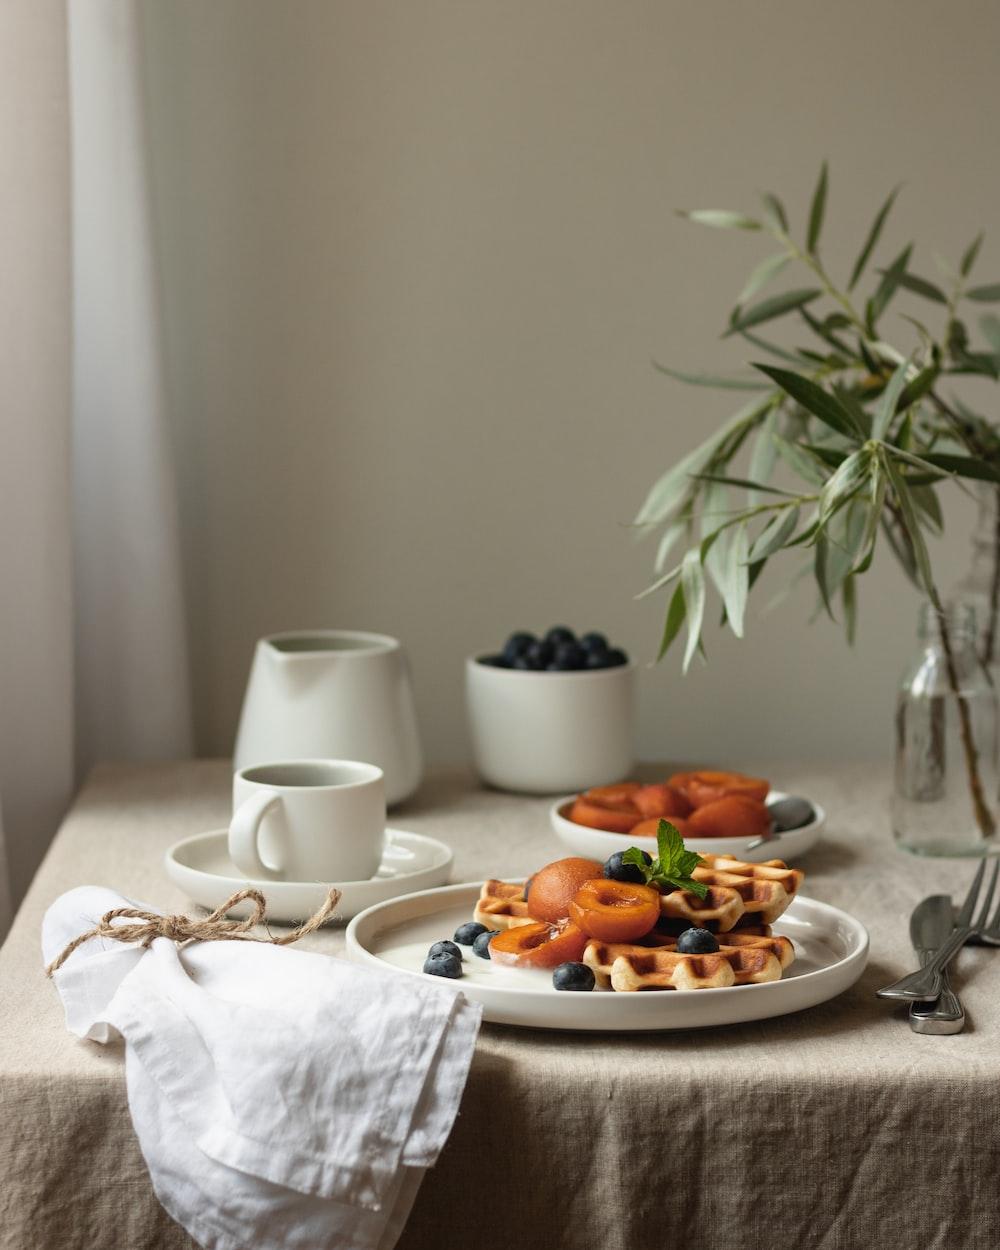 white ceramic mug on white ceramic plate